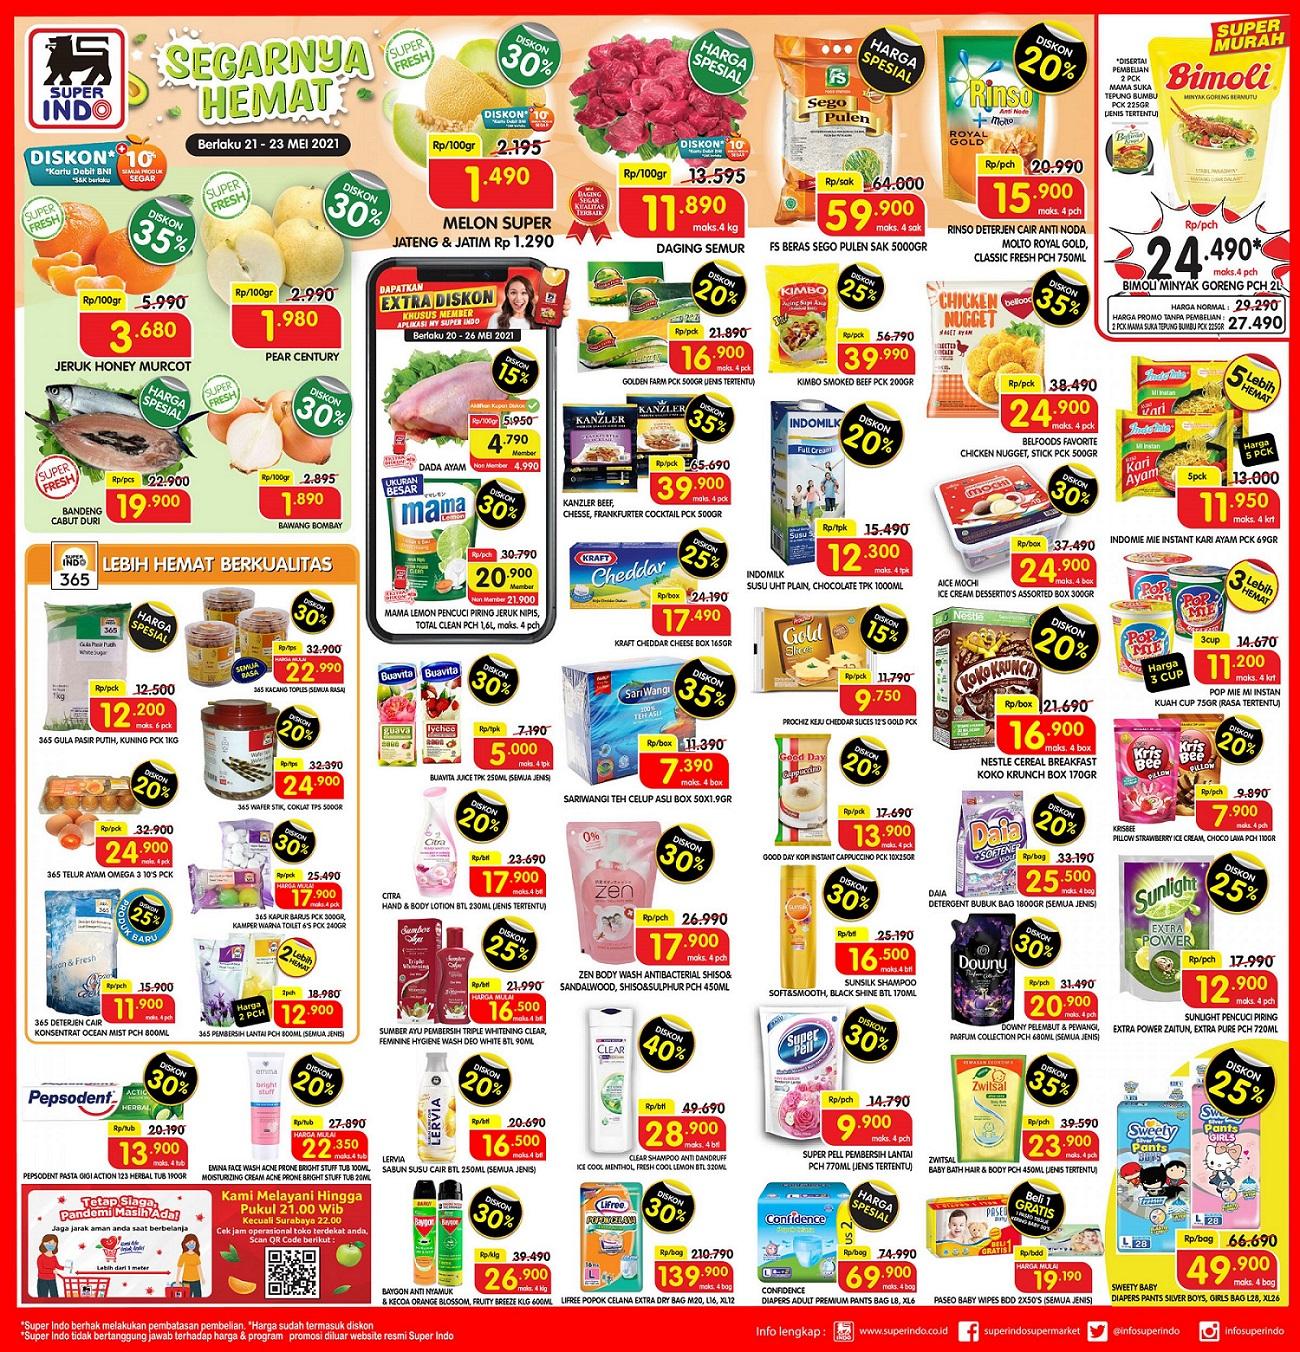 Katalog Promo JSM Superindo 21-23 Mei 2021.